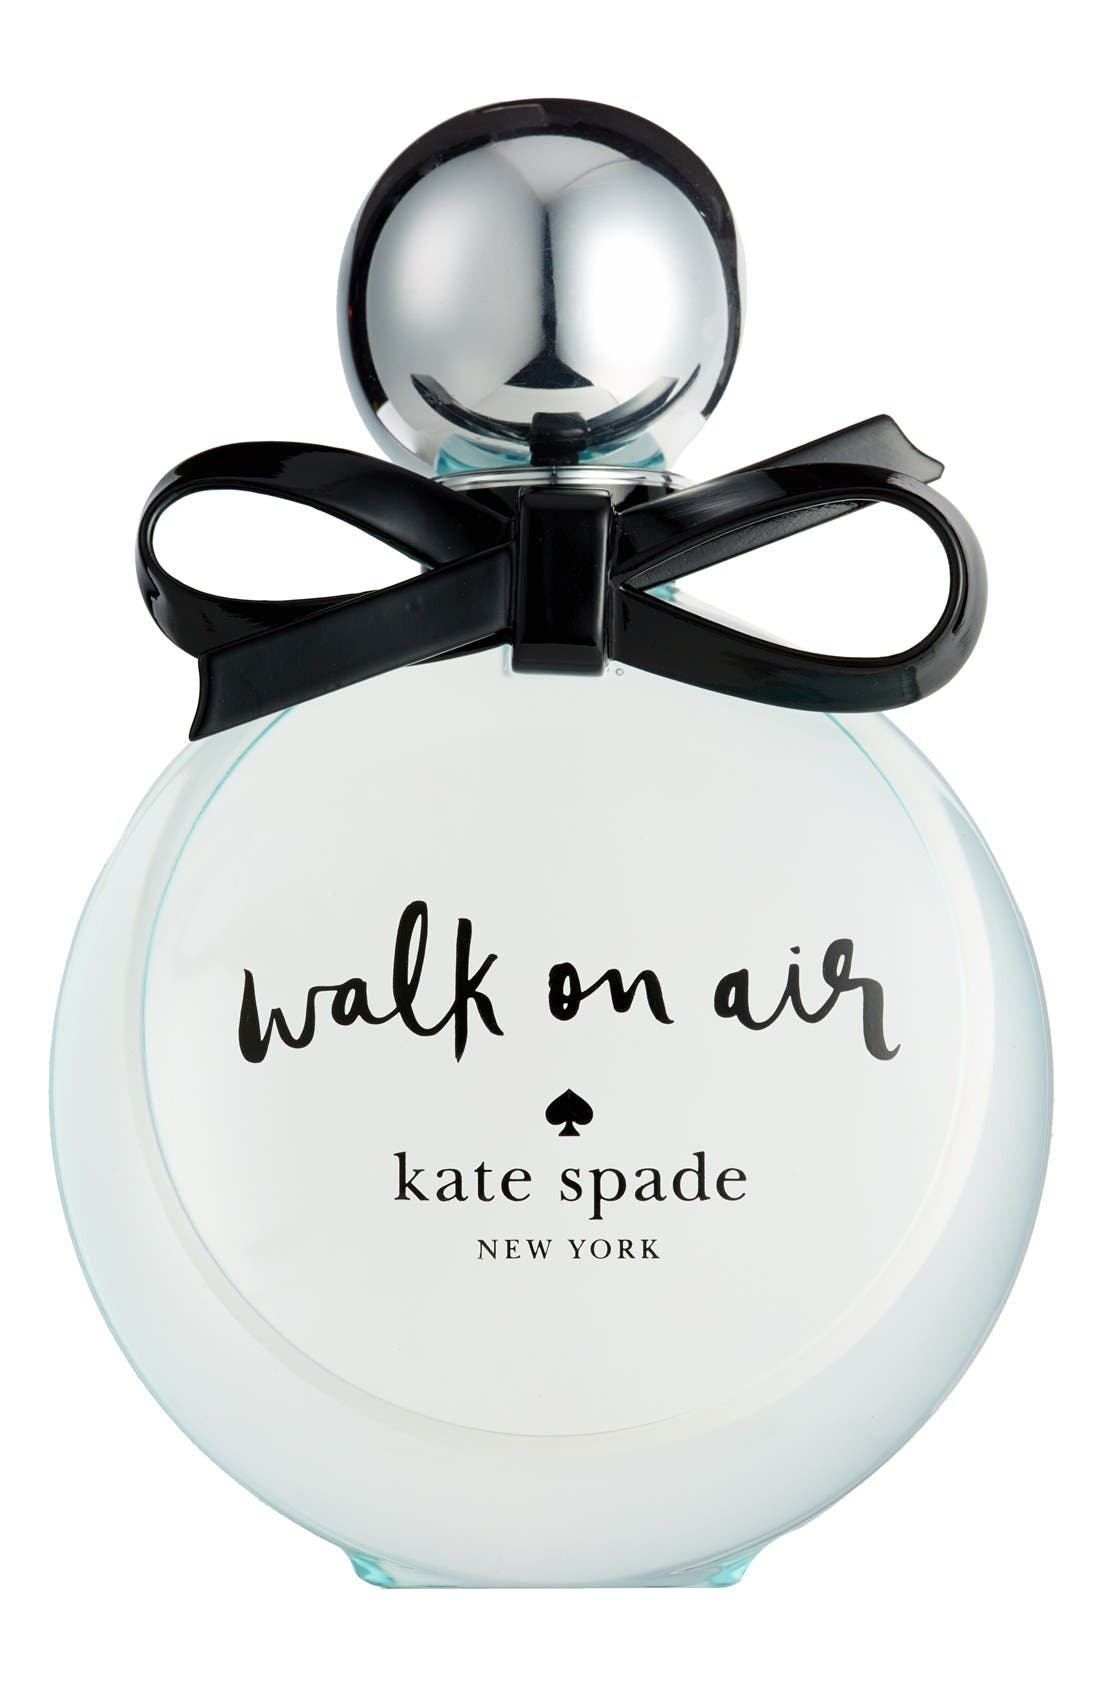 kate spade new york 'walk on air' eau de parfum